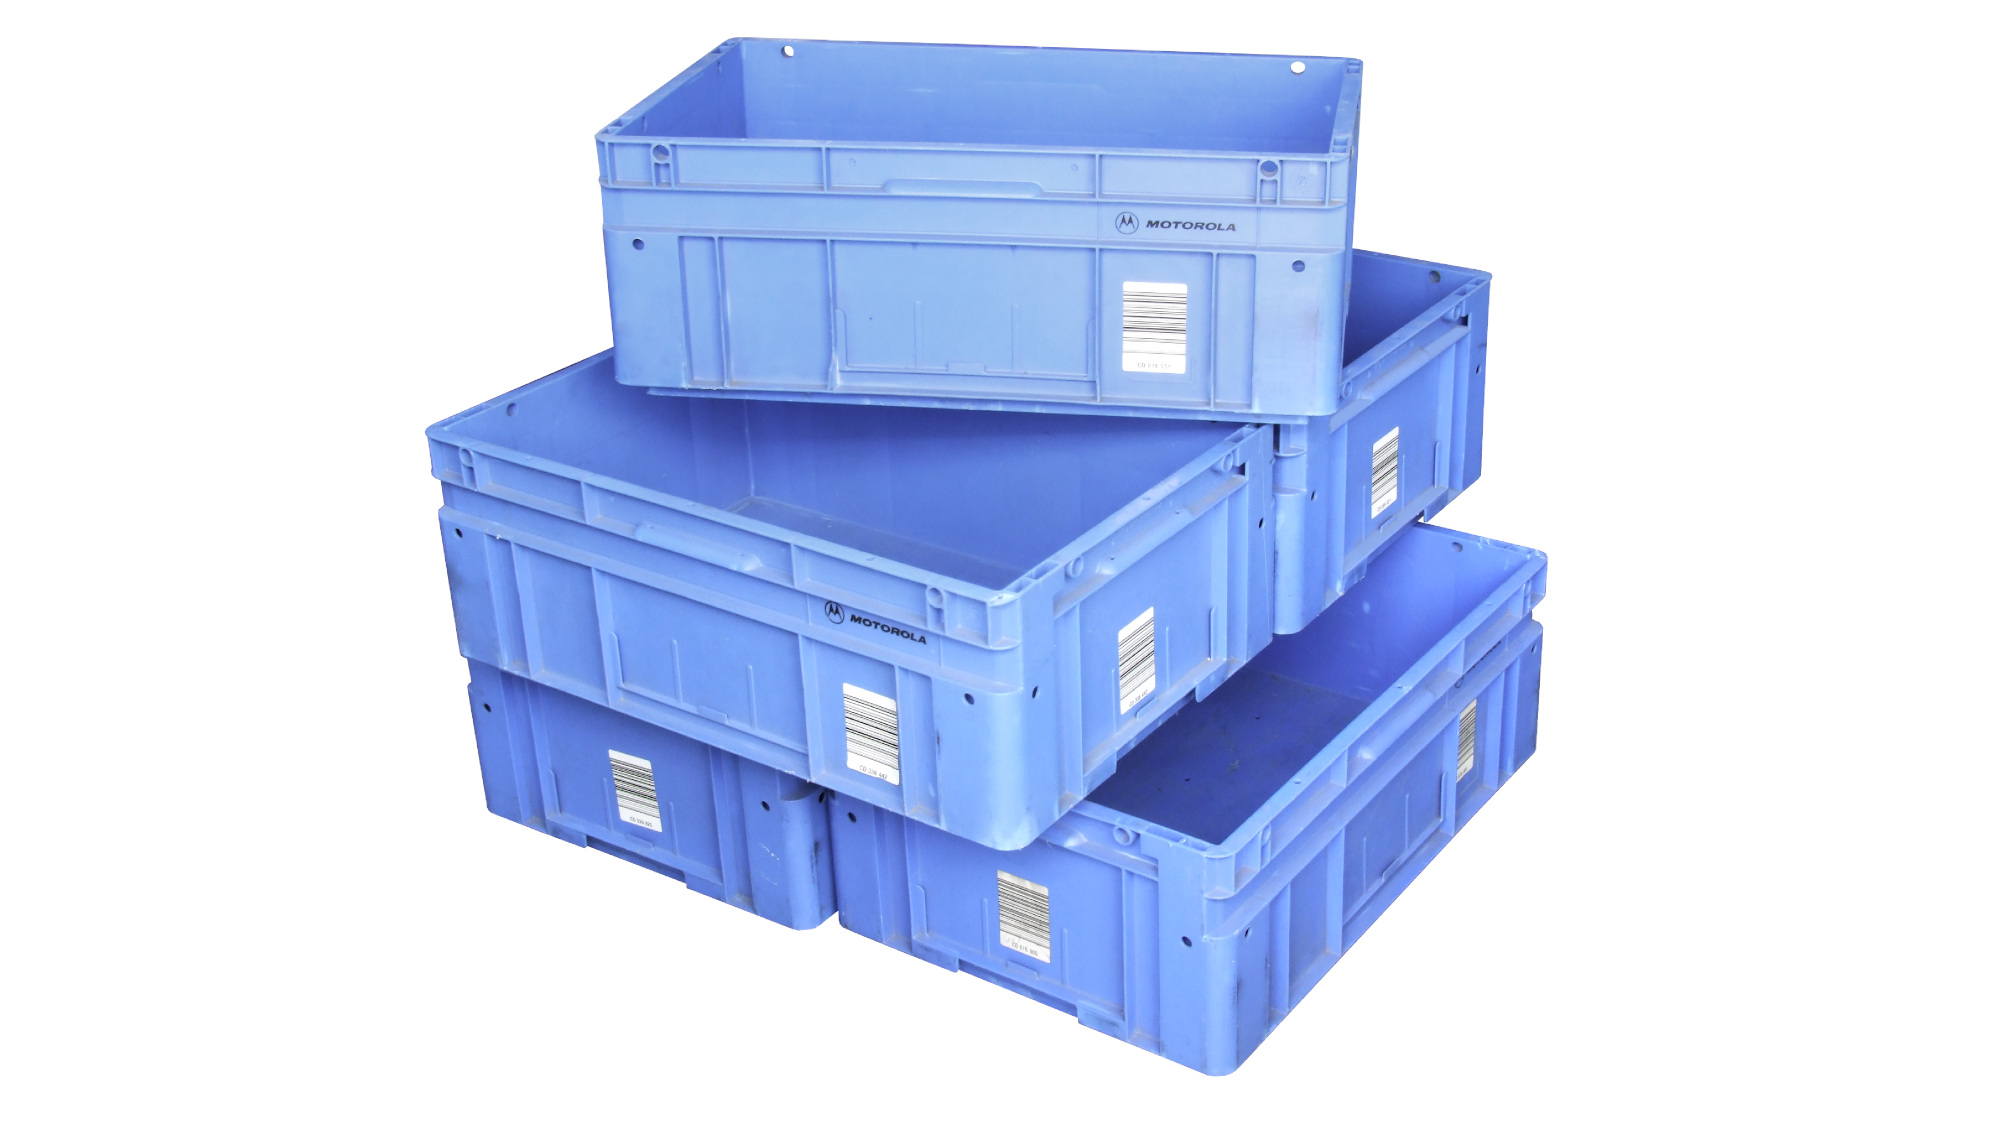 Euro-Boxen leihen